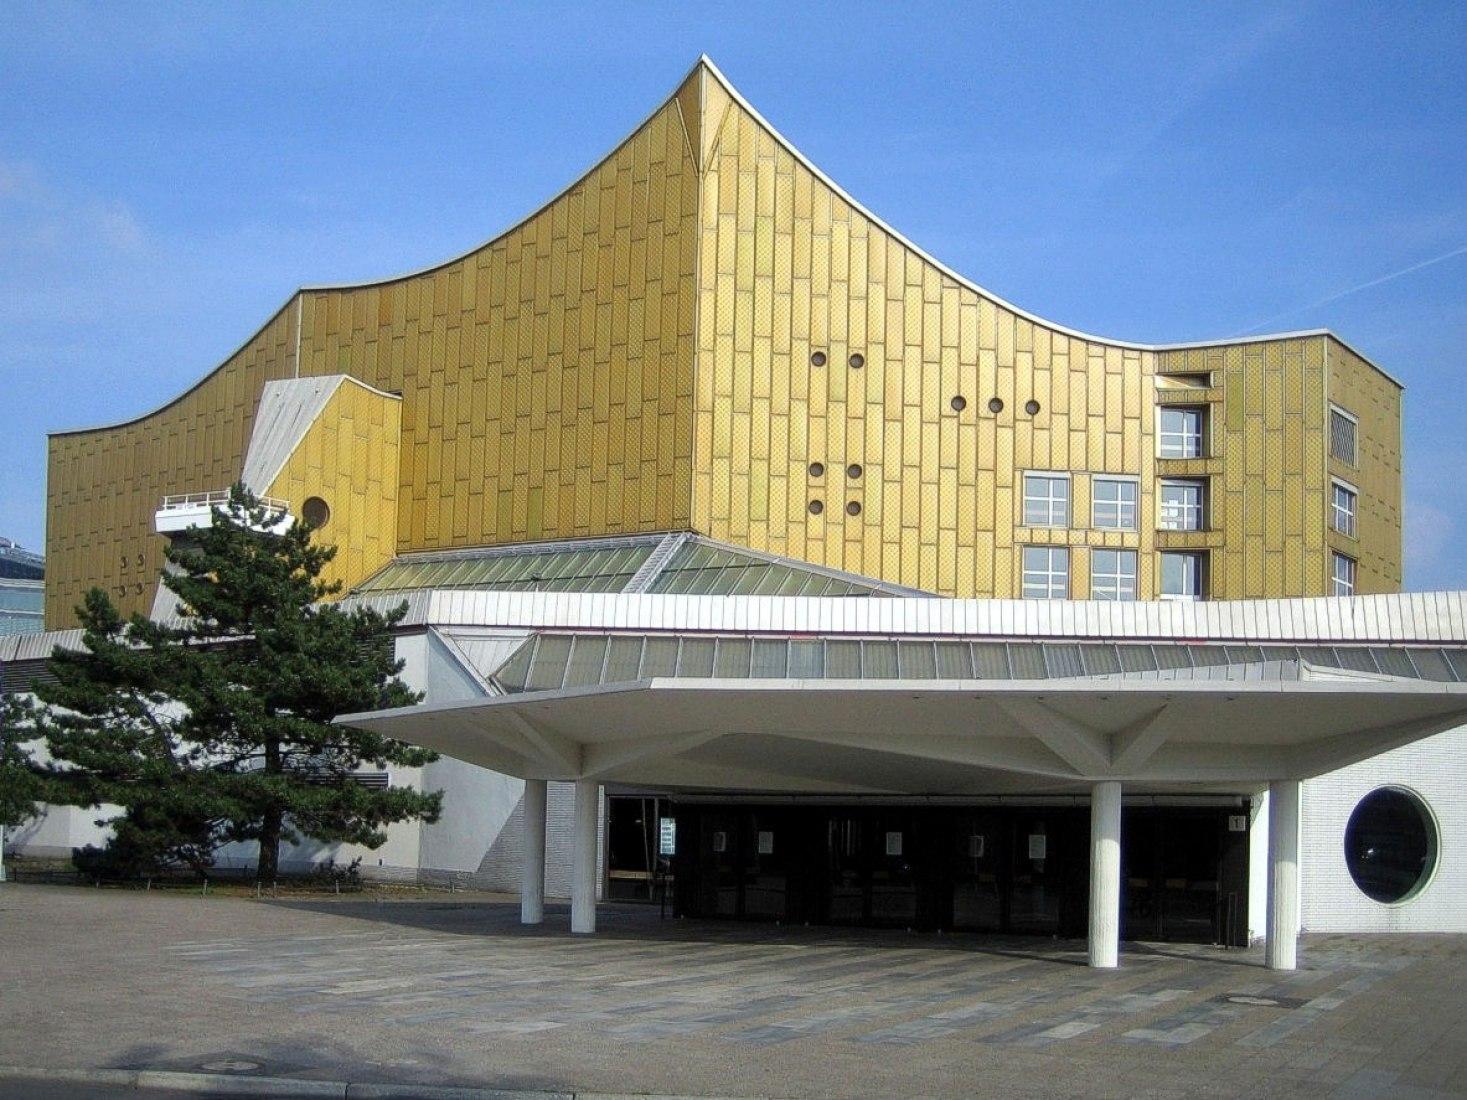 Wim Wenders (Germany) - Berlin Philharmonic in Berlin, Germany. Image via Wikimedia Commons.